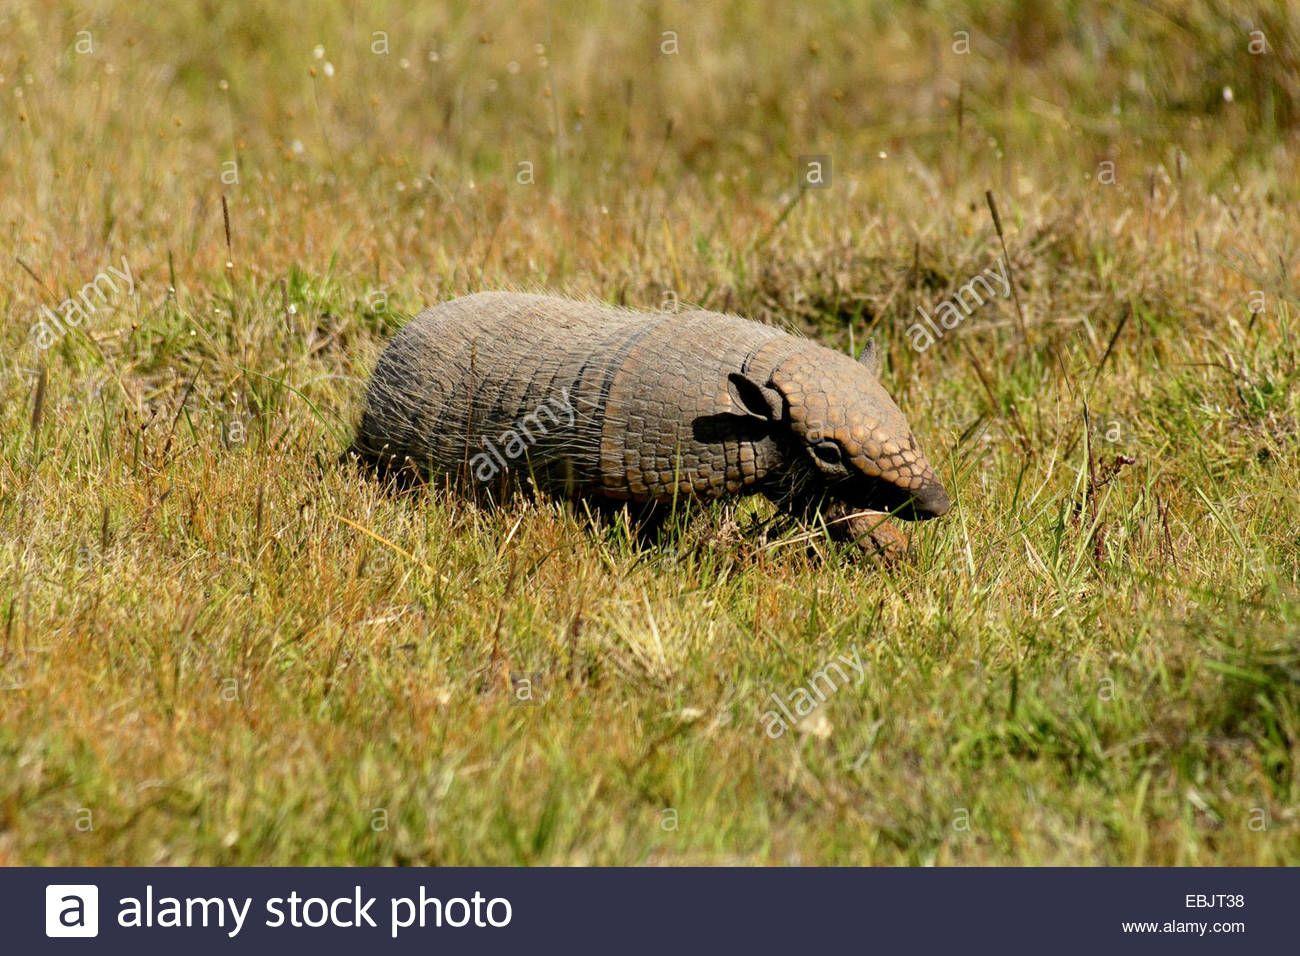 Seven-banded armadillo